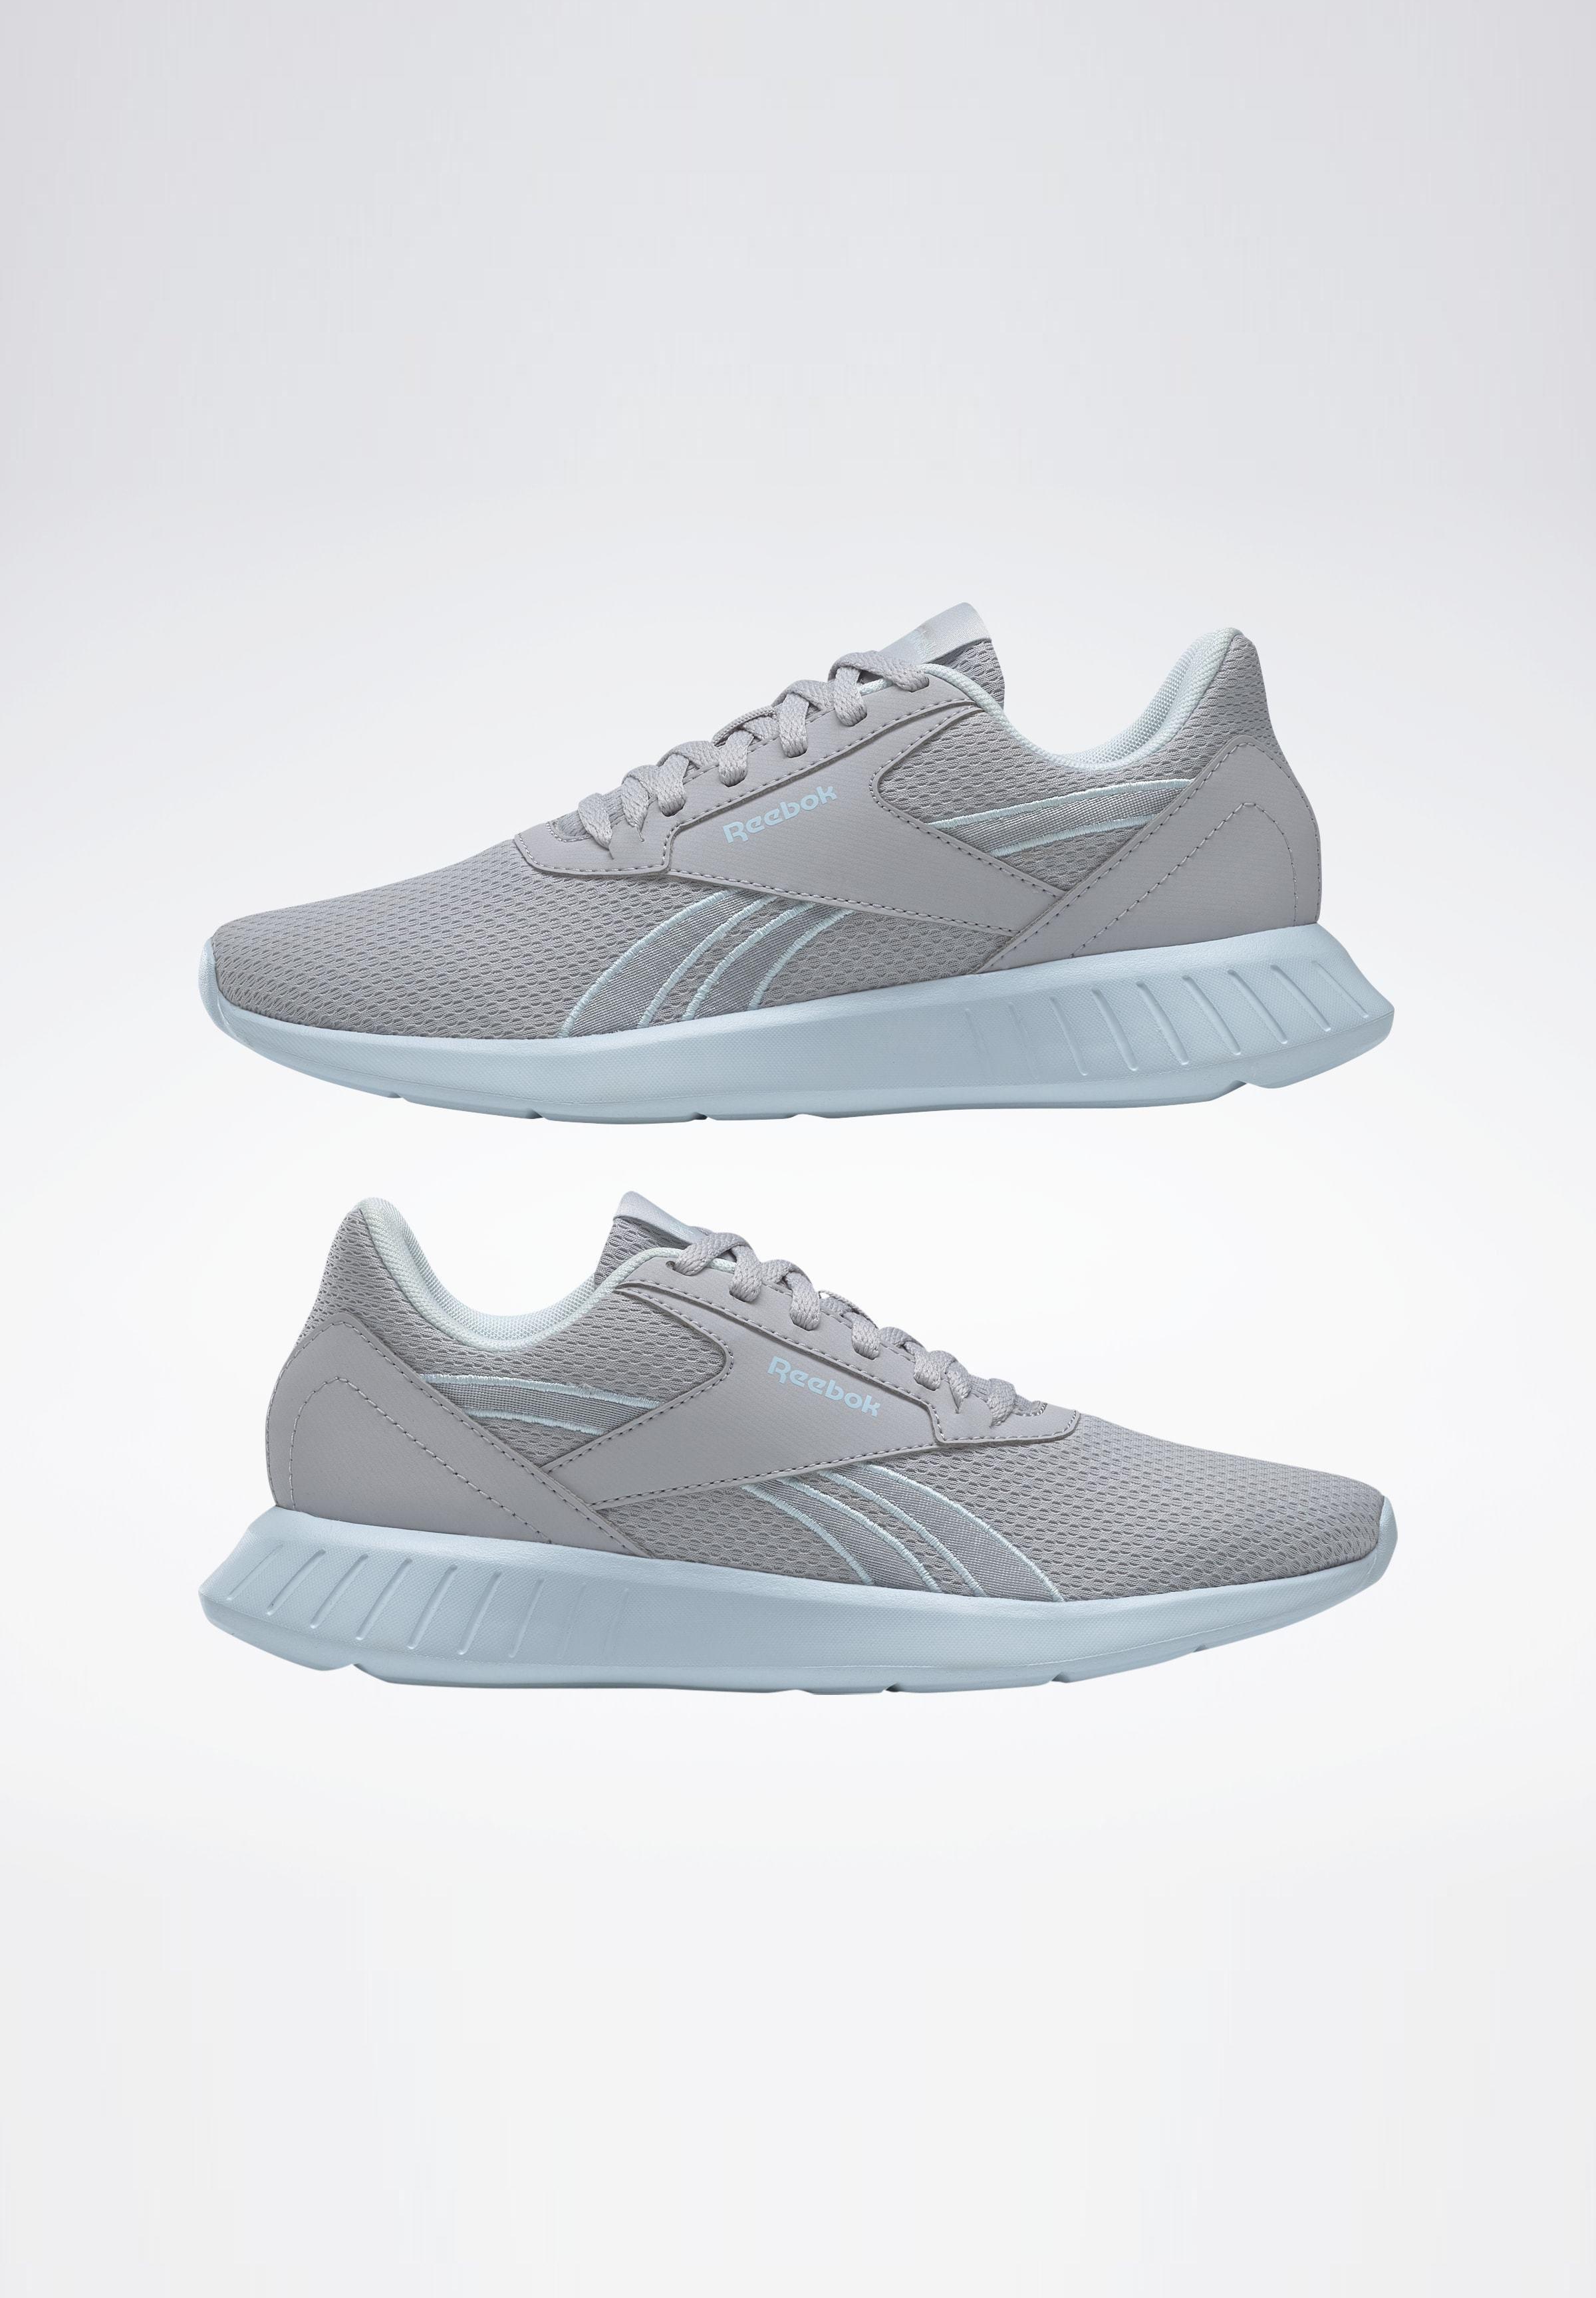 REEBOK LITE 2.0 cold grey 2